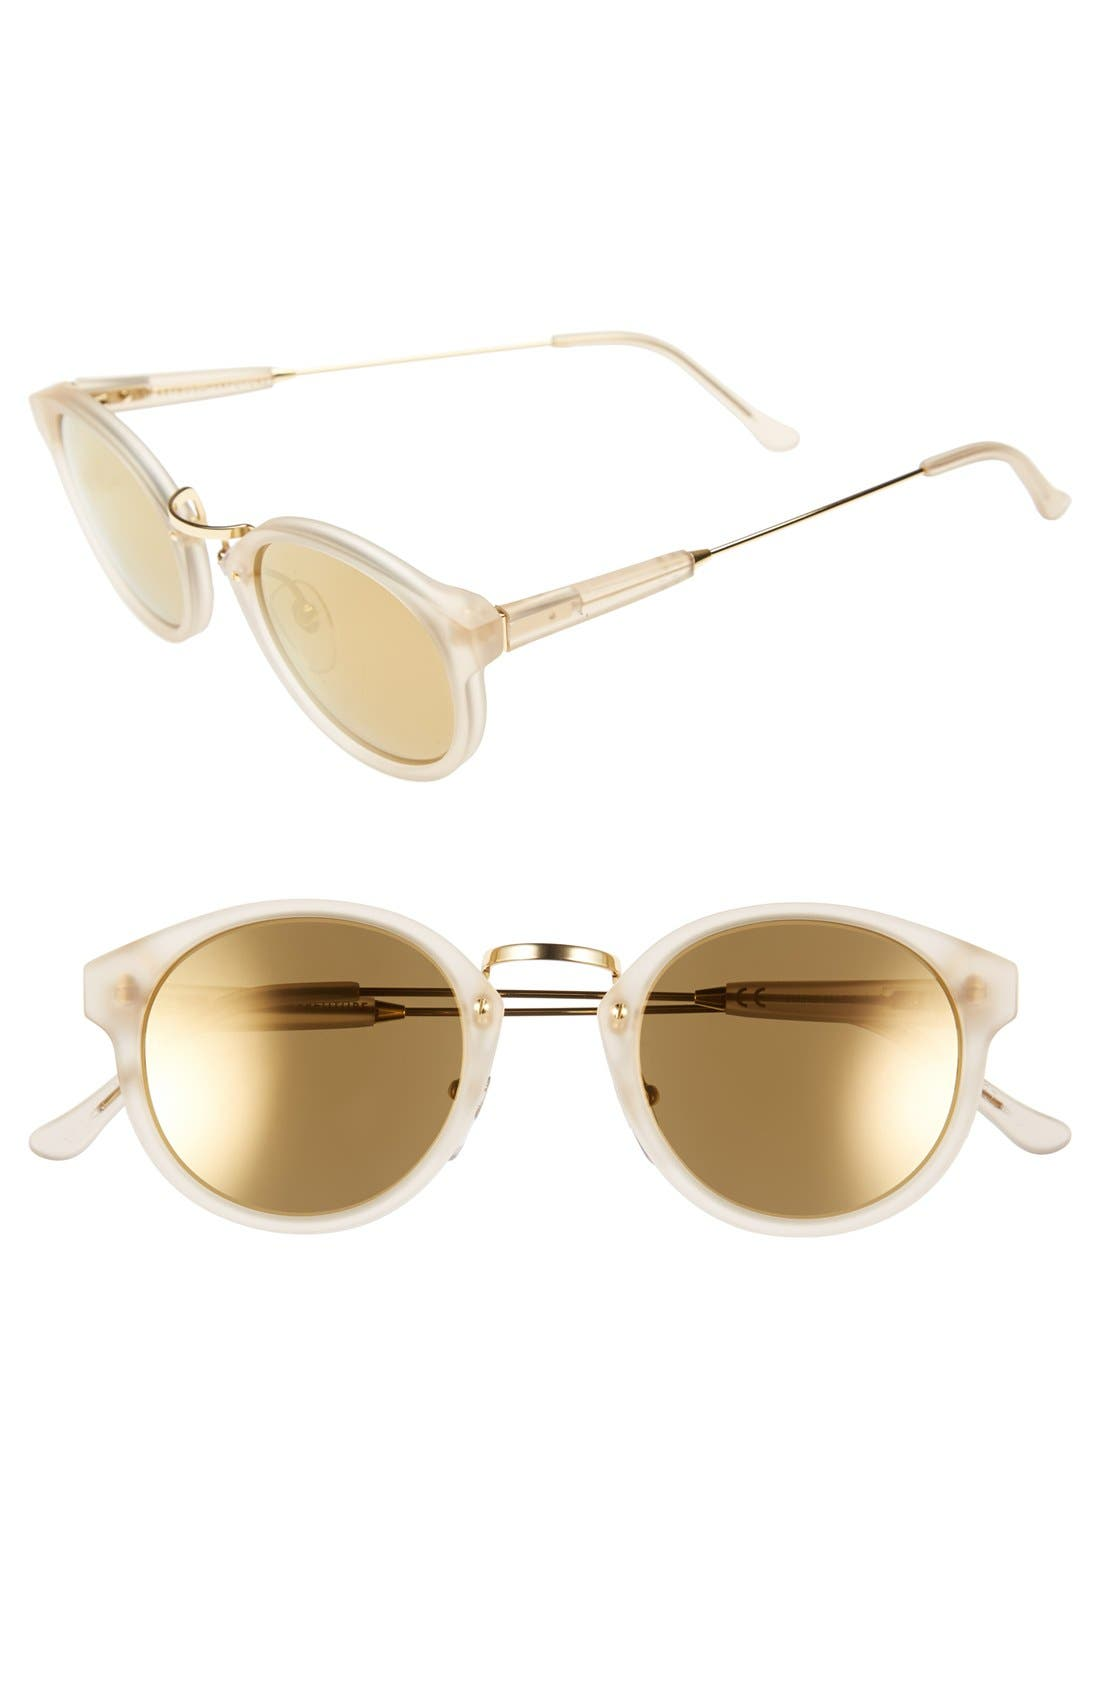 Alternate Image 1 Selected - SUPER by RETROSUPERFUTURE® 'Panama' 46mm Mirrored Sunglasses